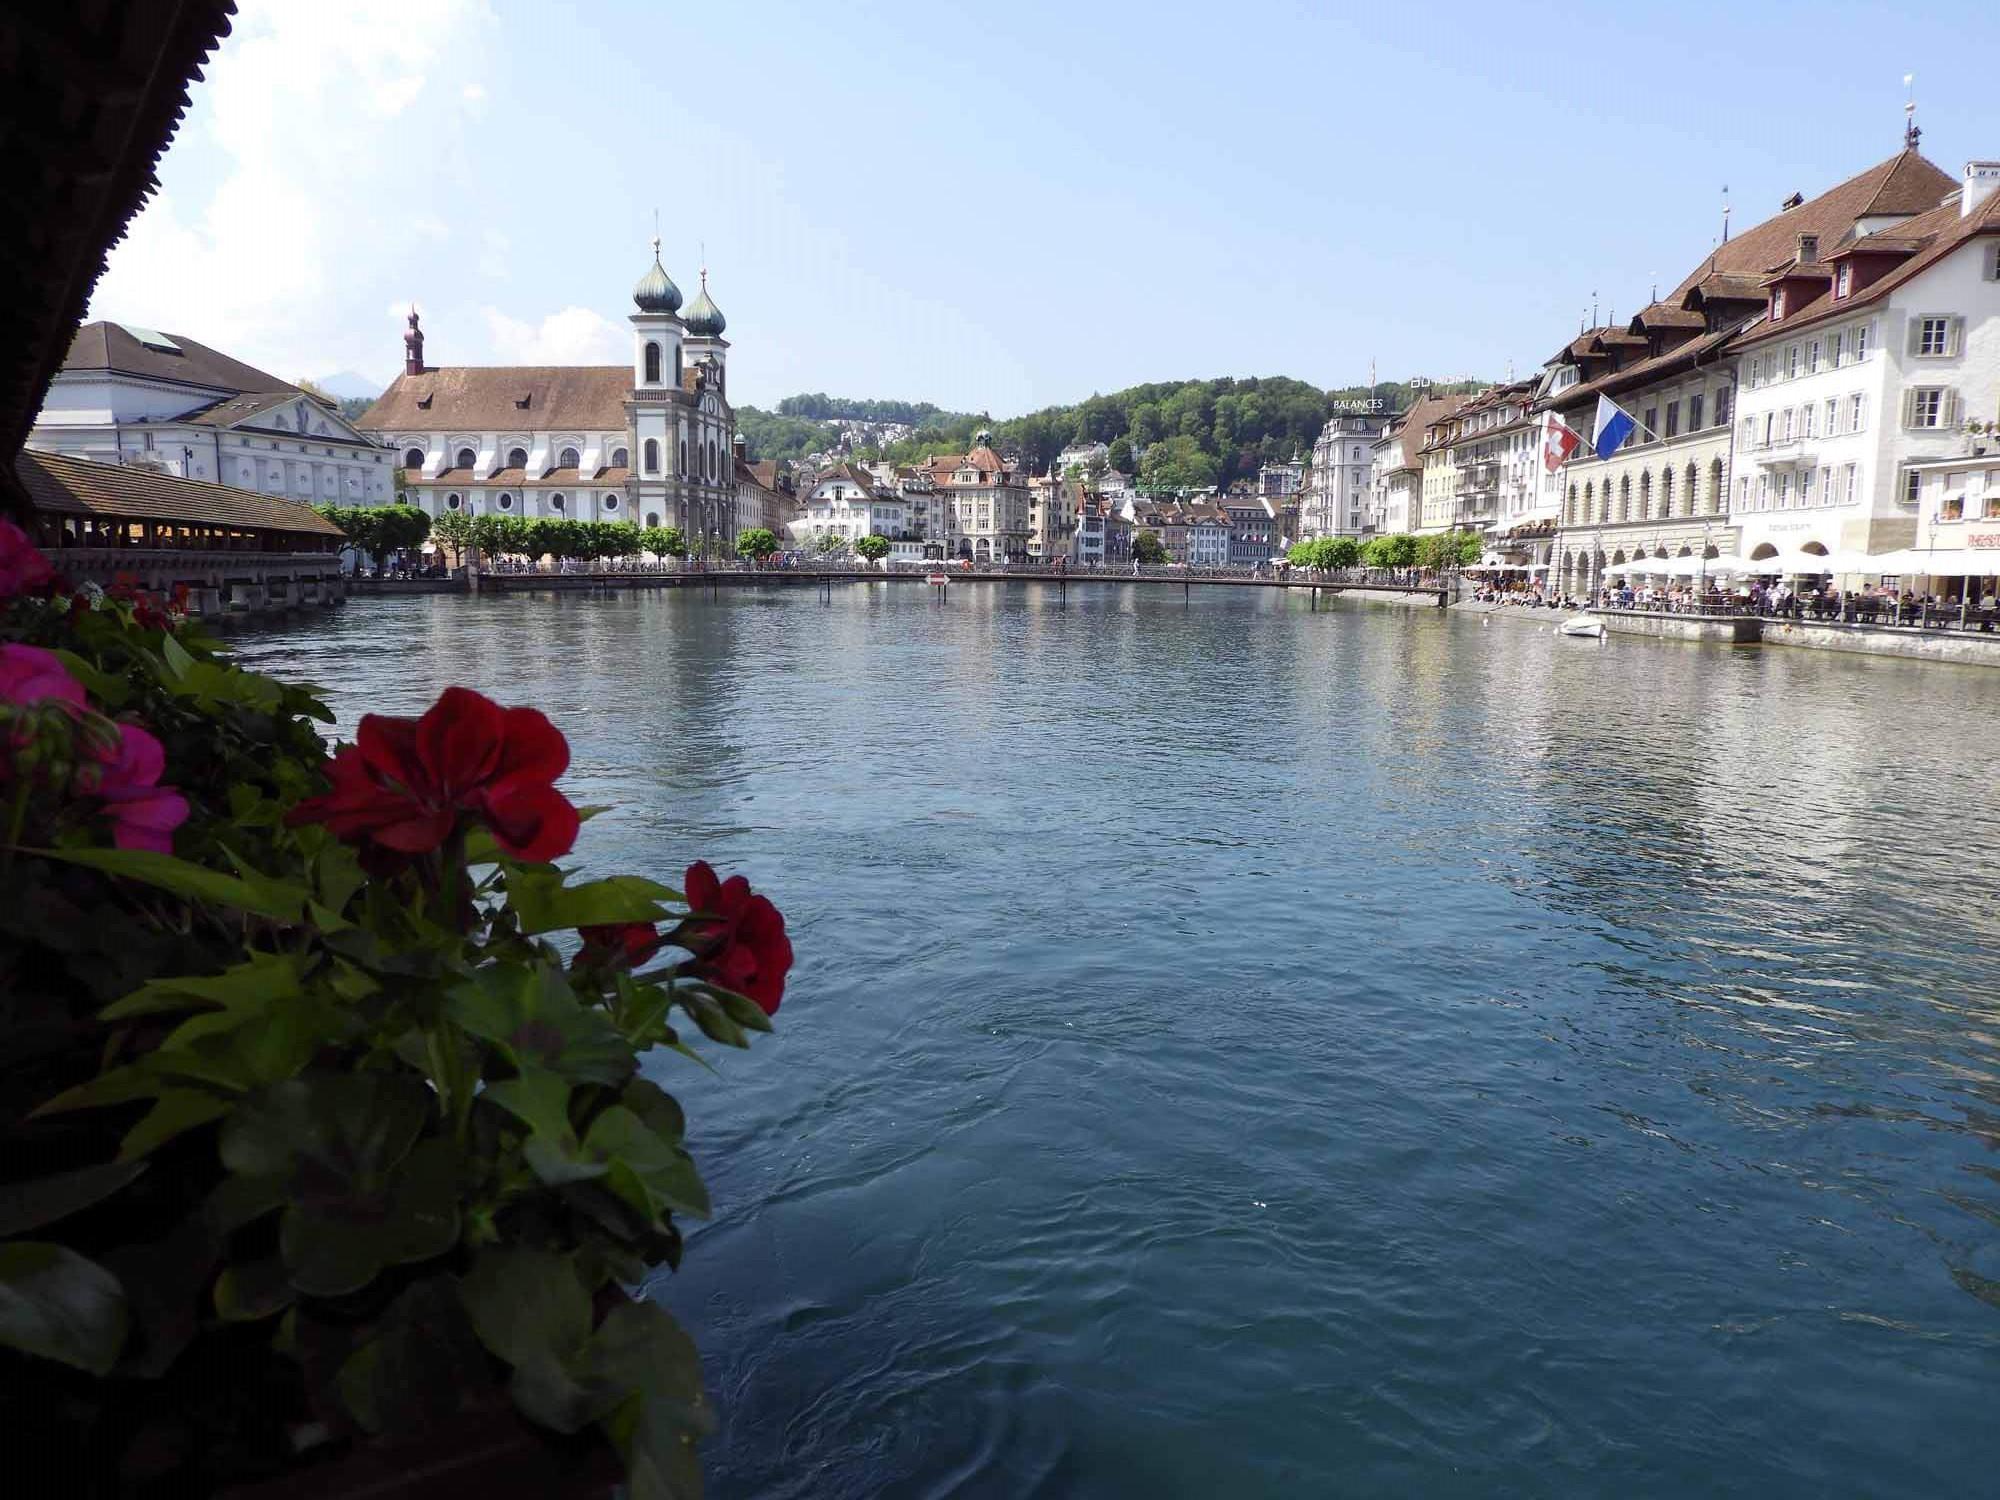 switzerland-lucerne-chaple-bridge-flowers-river-cross.JPG